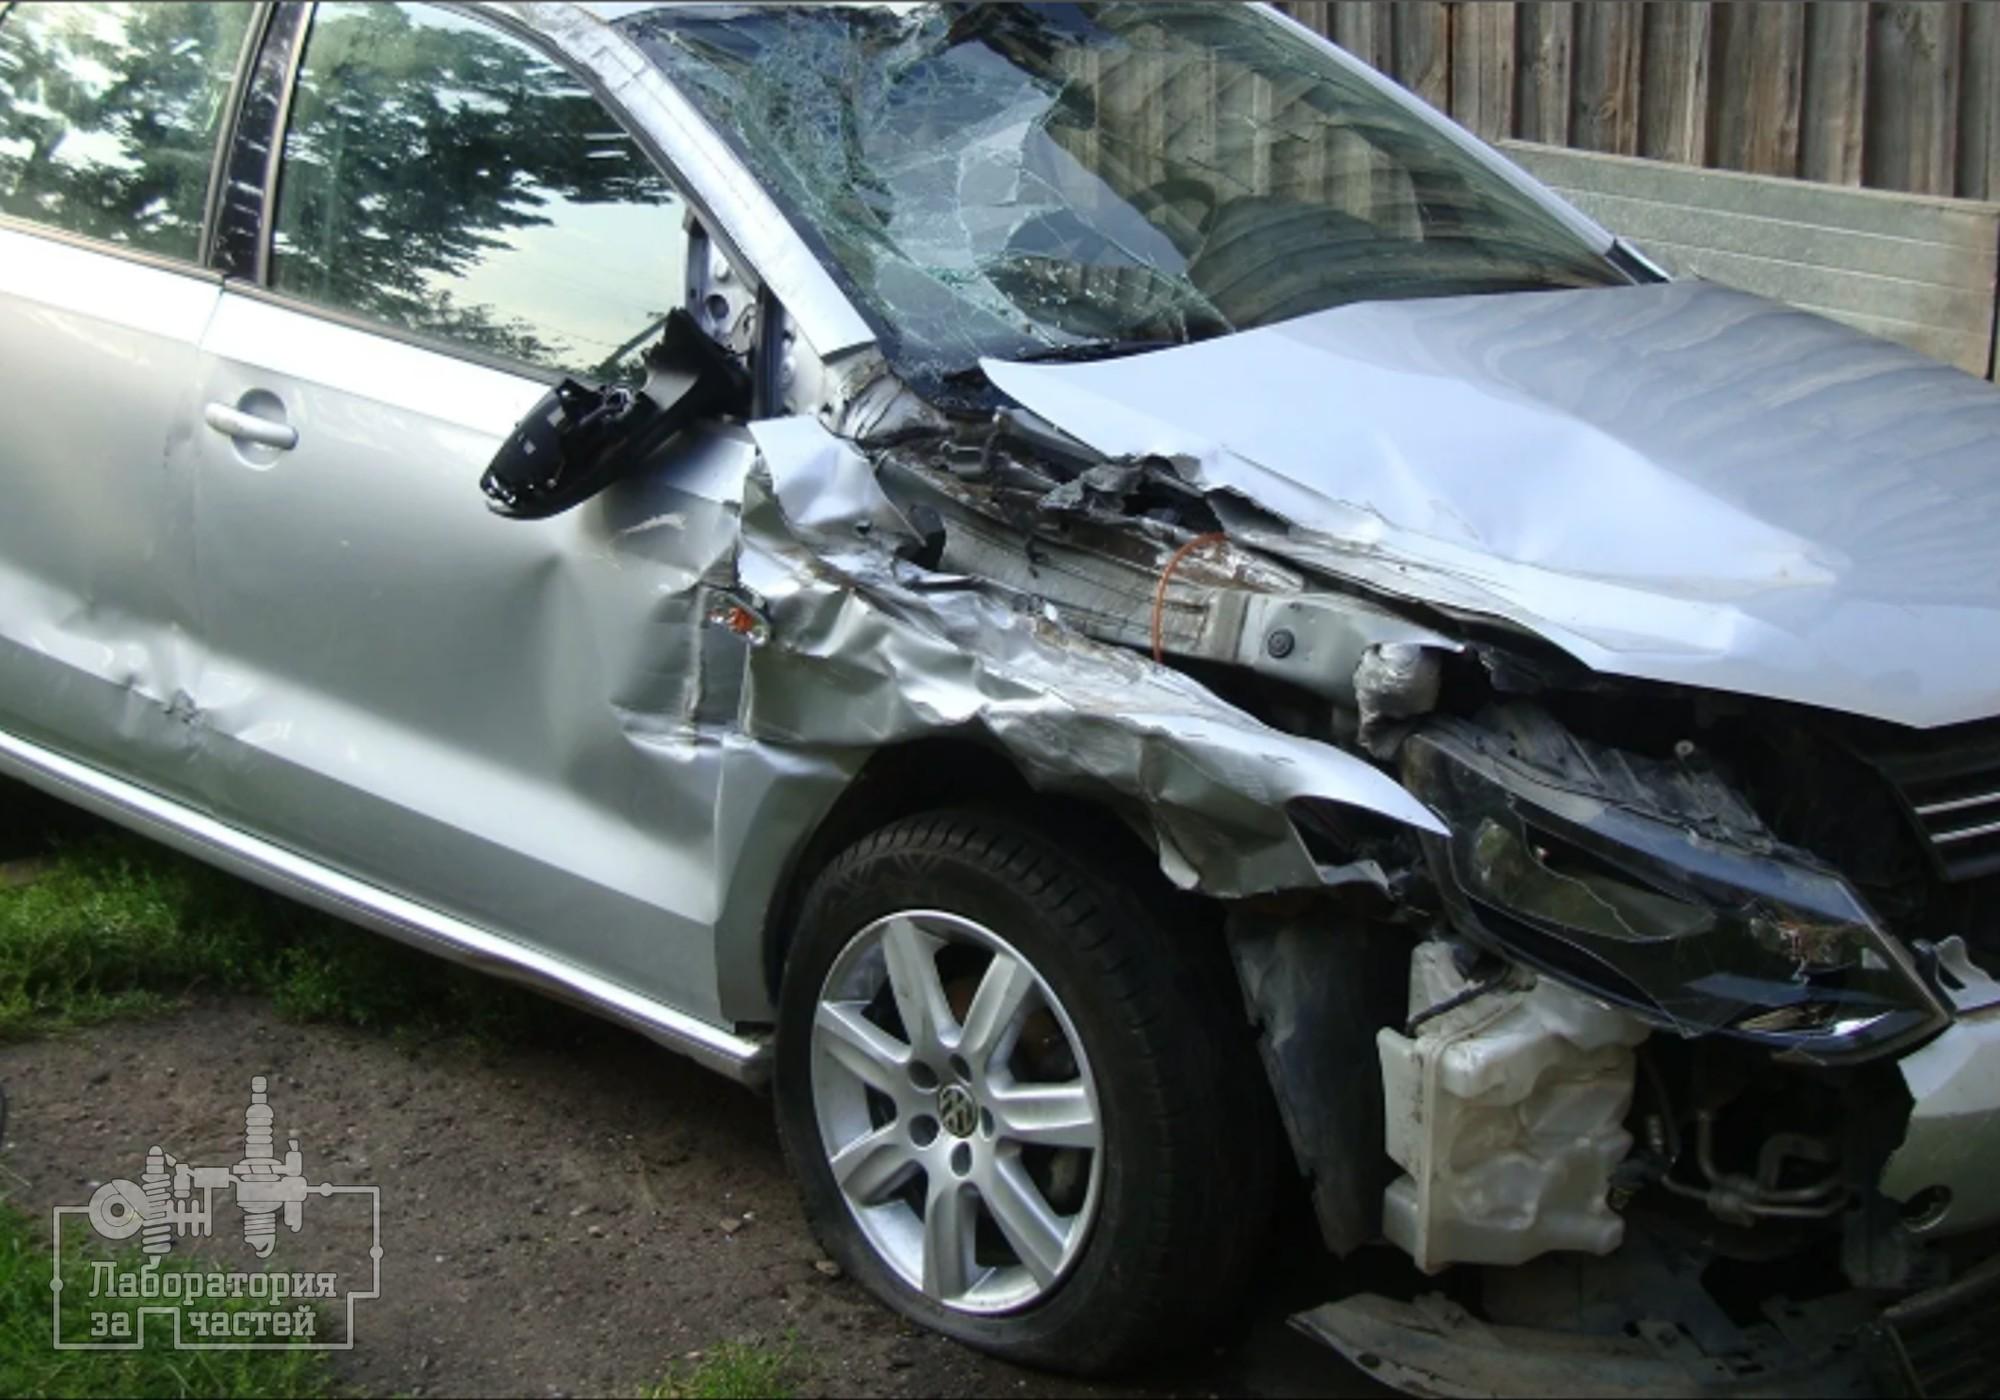 Volkswagen Polo V 2011 г. в разборе